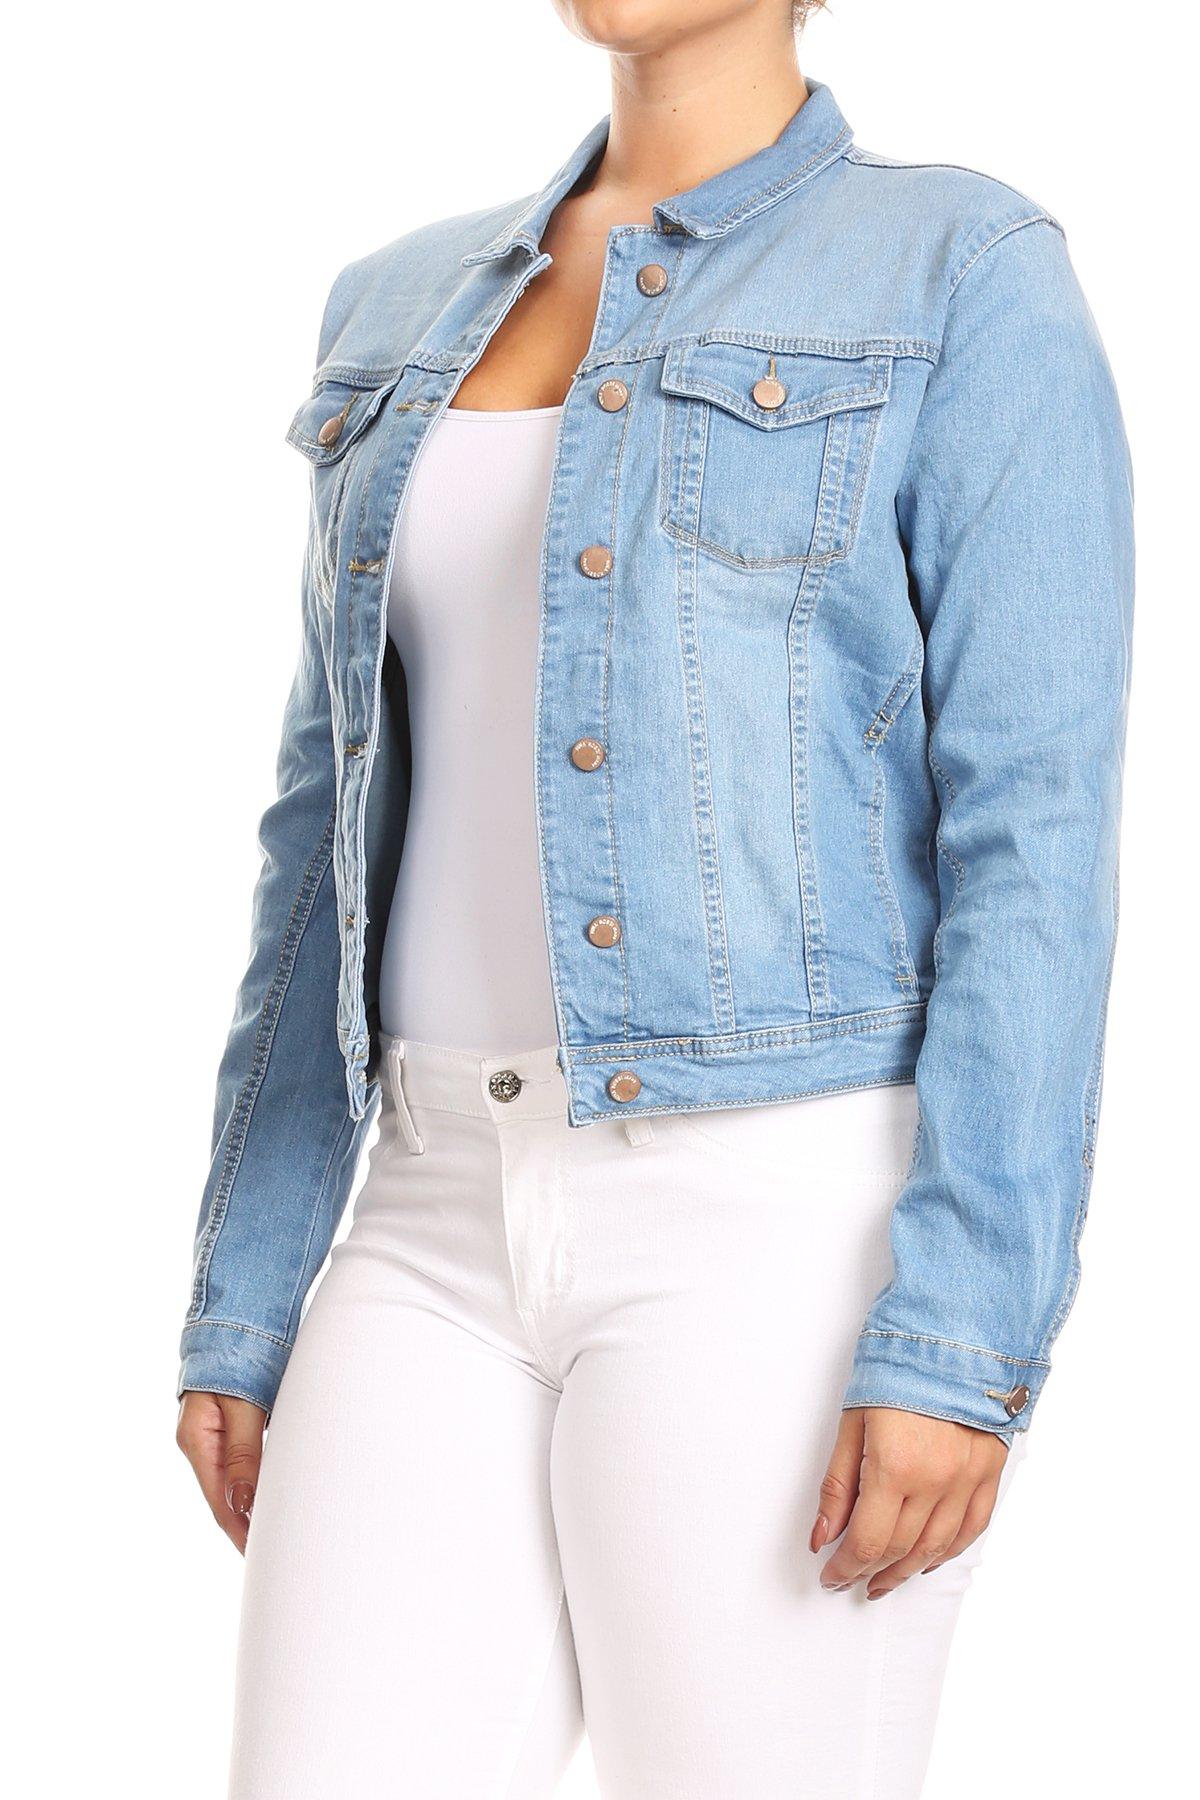 Women-039-s-Premium-Denim-Jackets-Long-Sleeve-Jean-Coats thumbnail 6